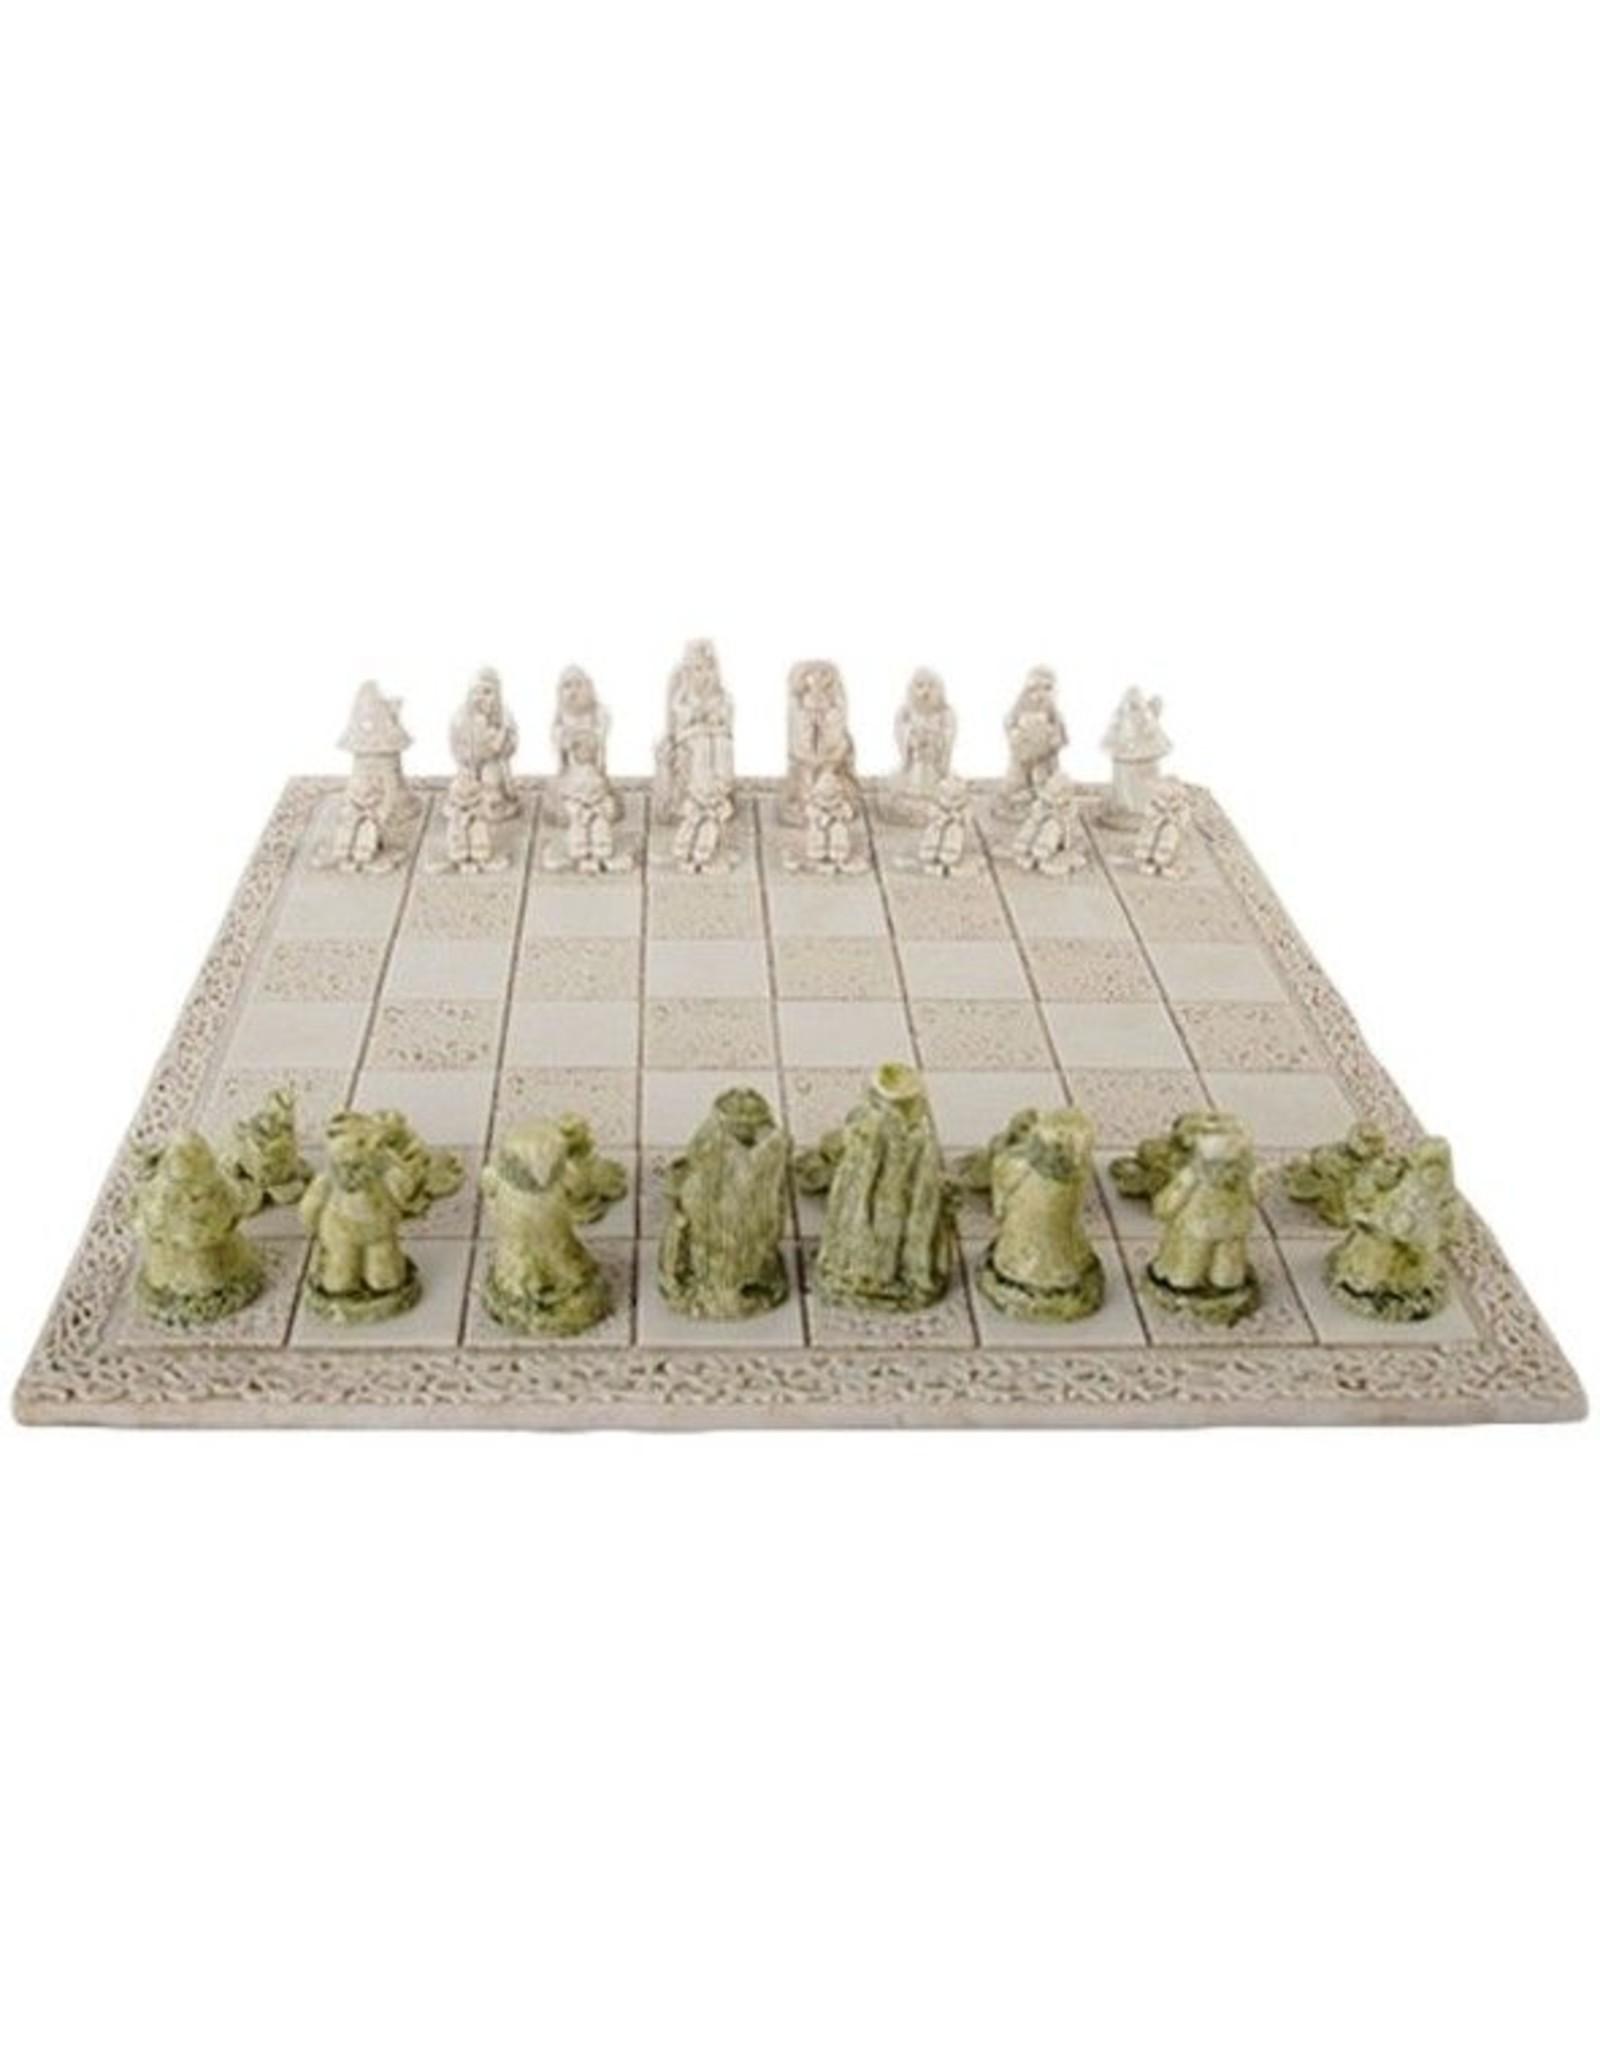 O'Gowna Handmade Leprechaun Chess Set